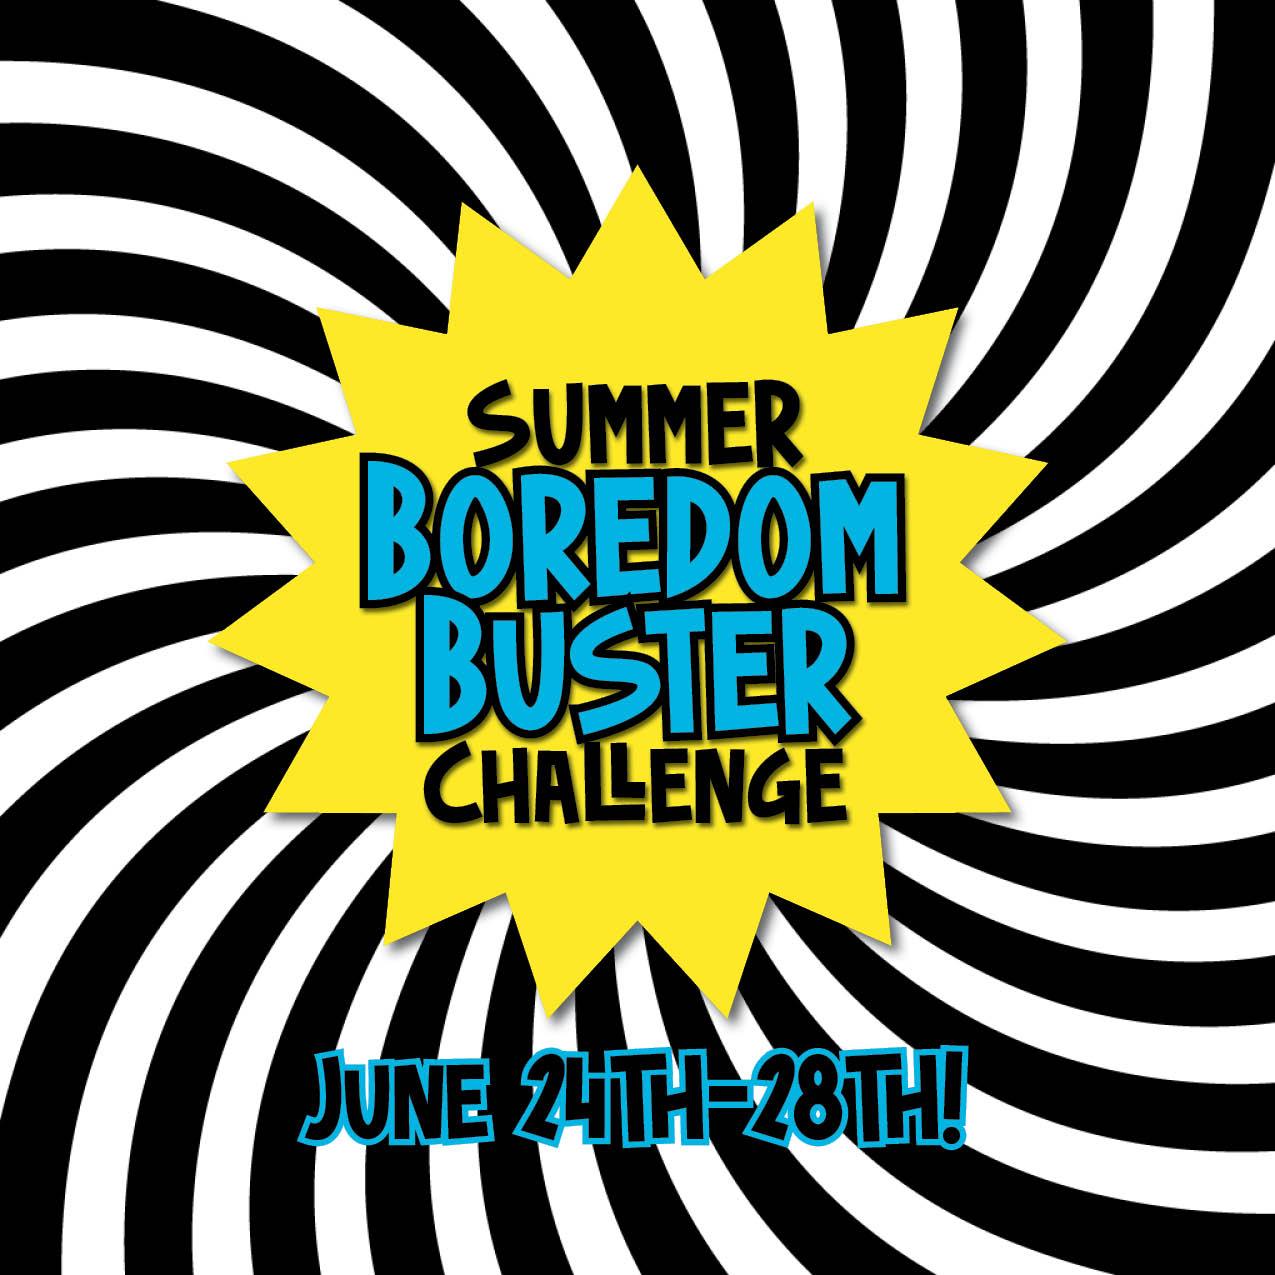 Summer Boredom Buster Challenge - COVER v2